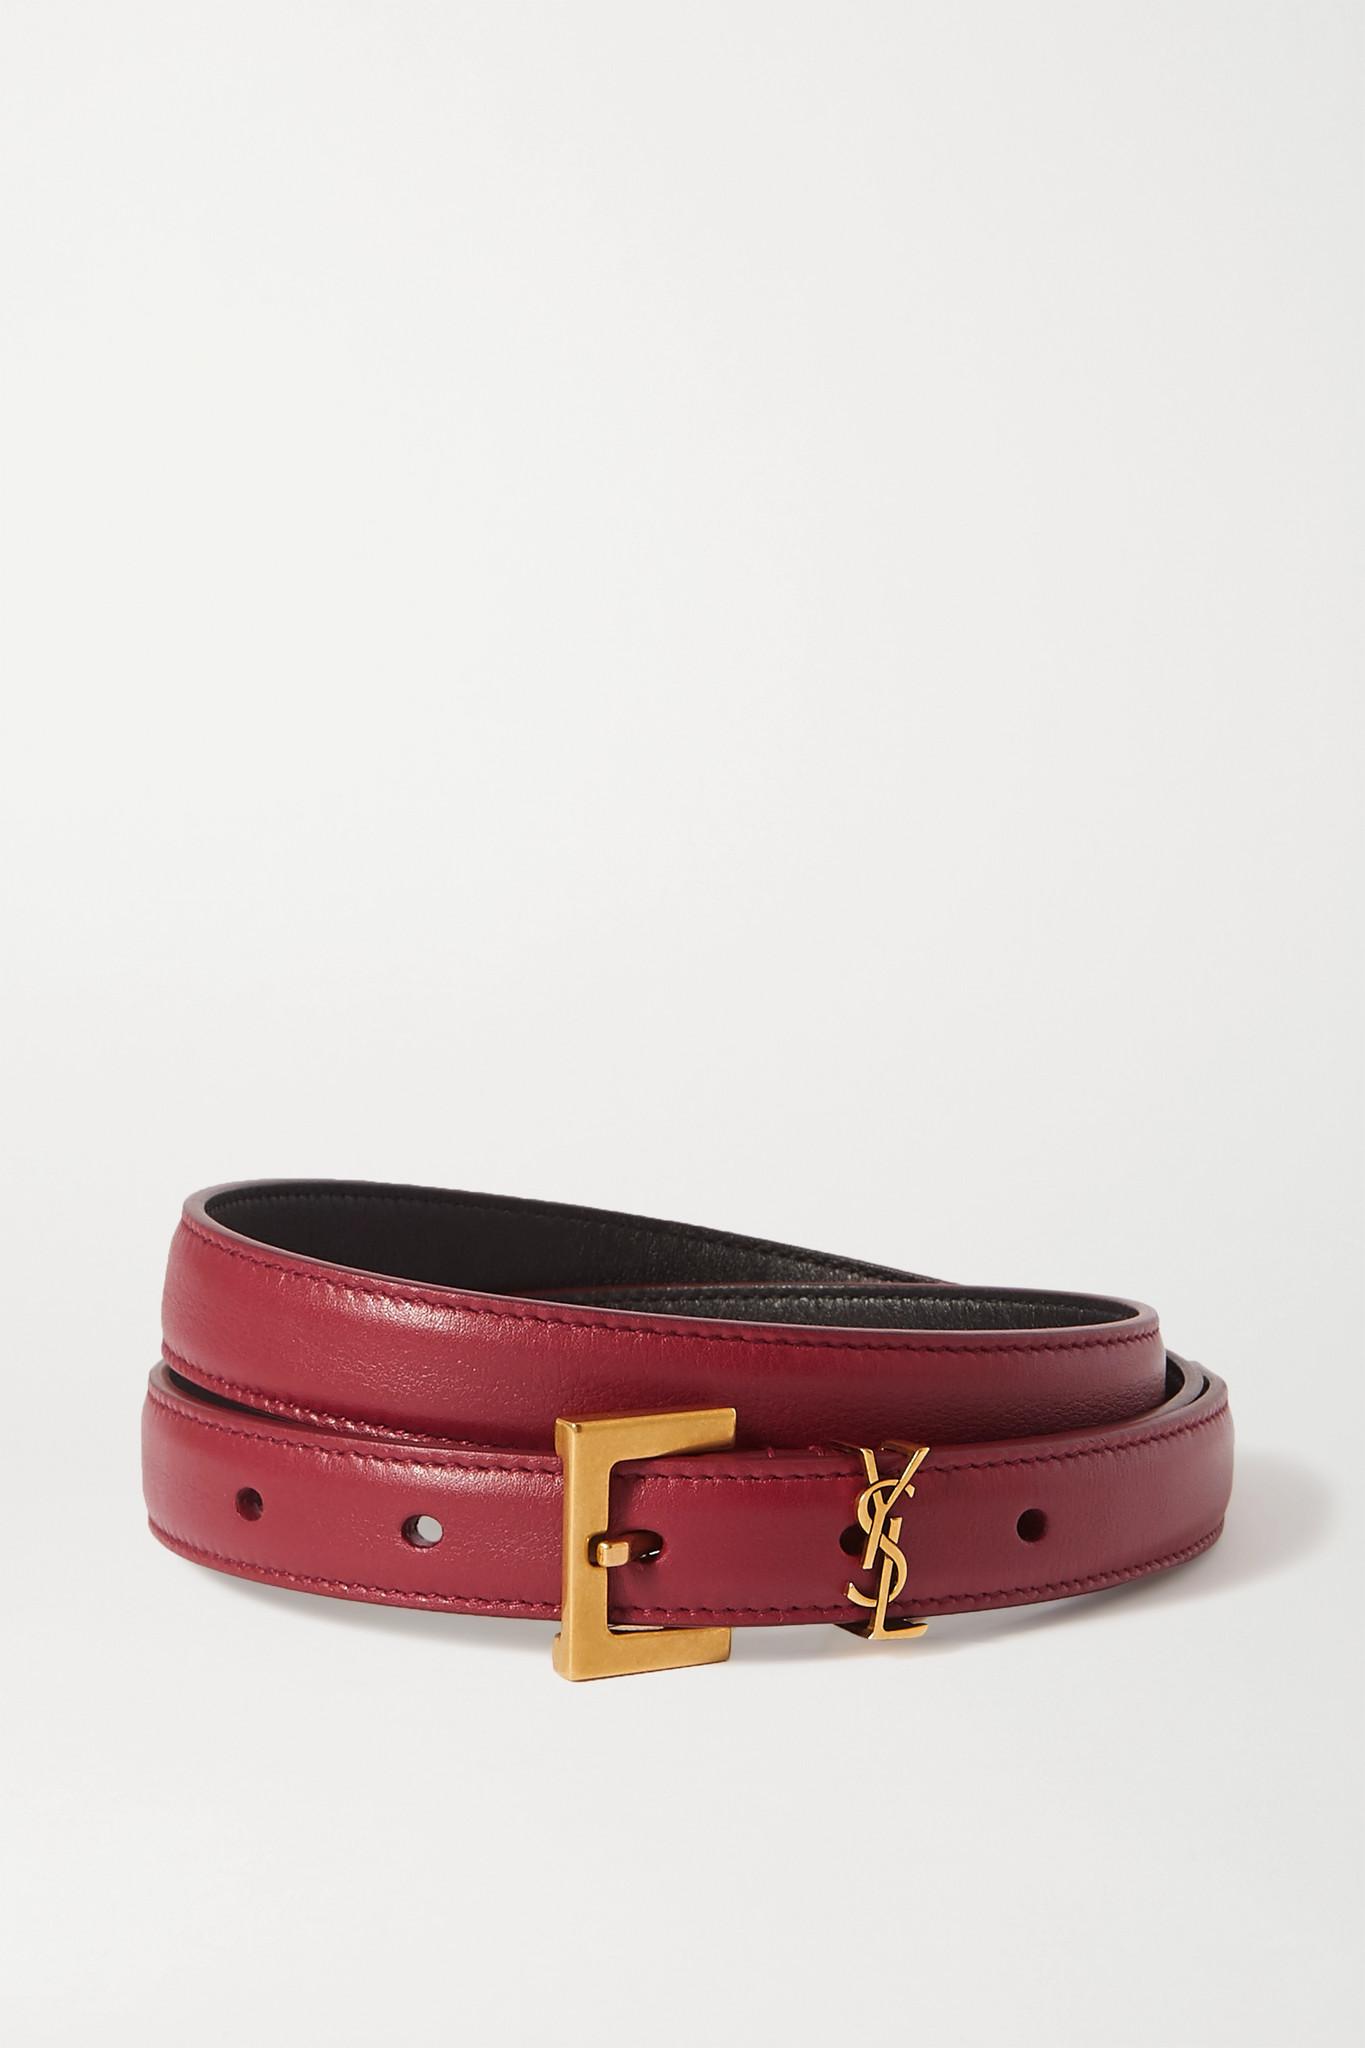 SAINT LAURENT - 皮革腰带 - 酒红色 - 90